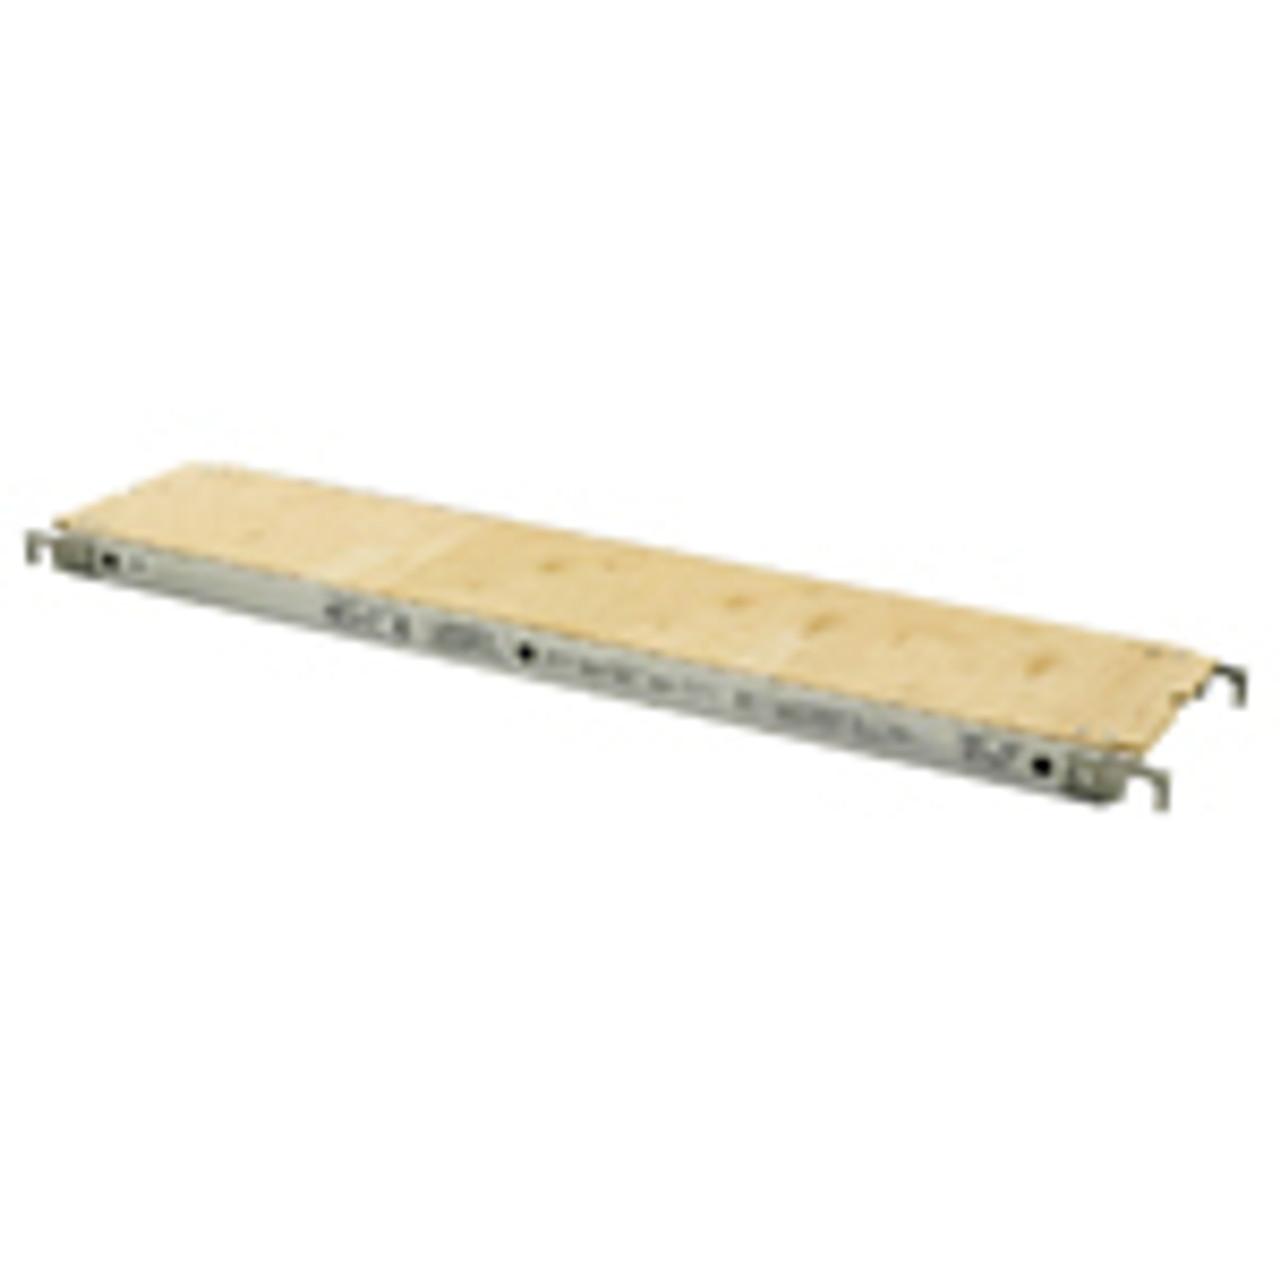 Planks for Steel Scaffold